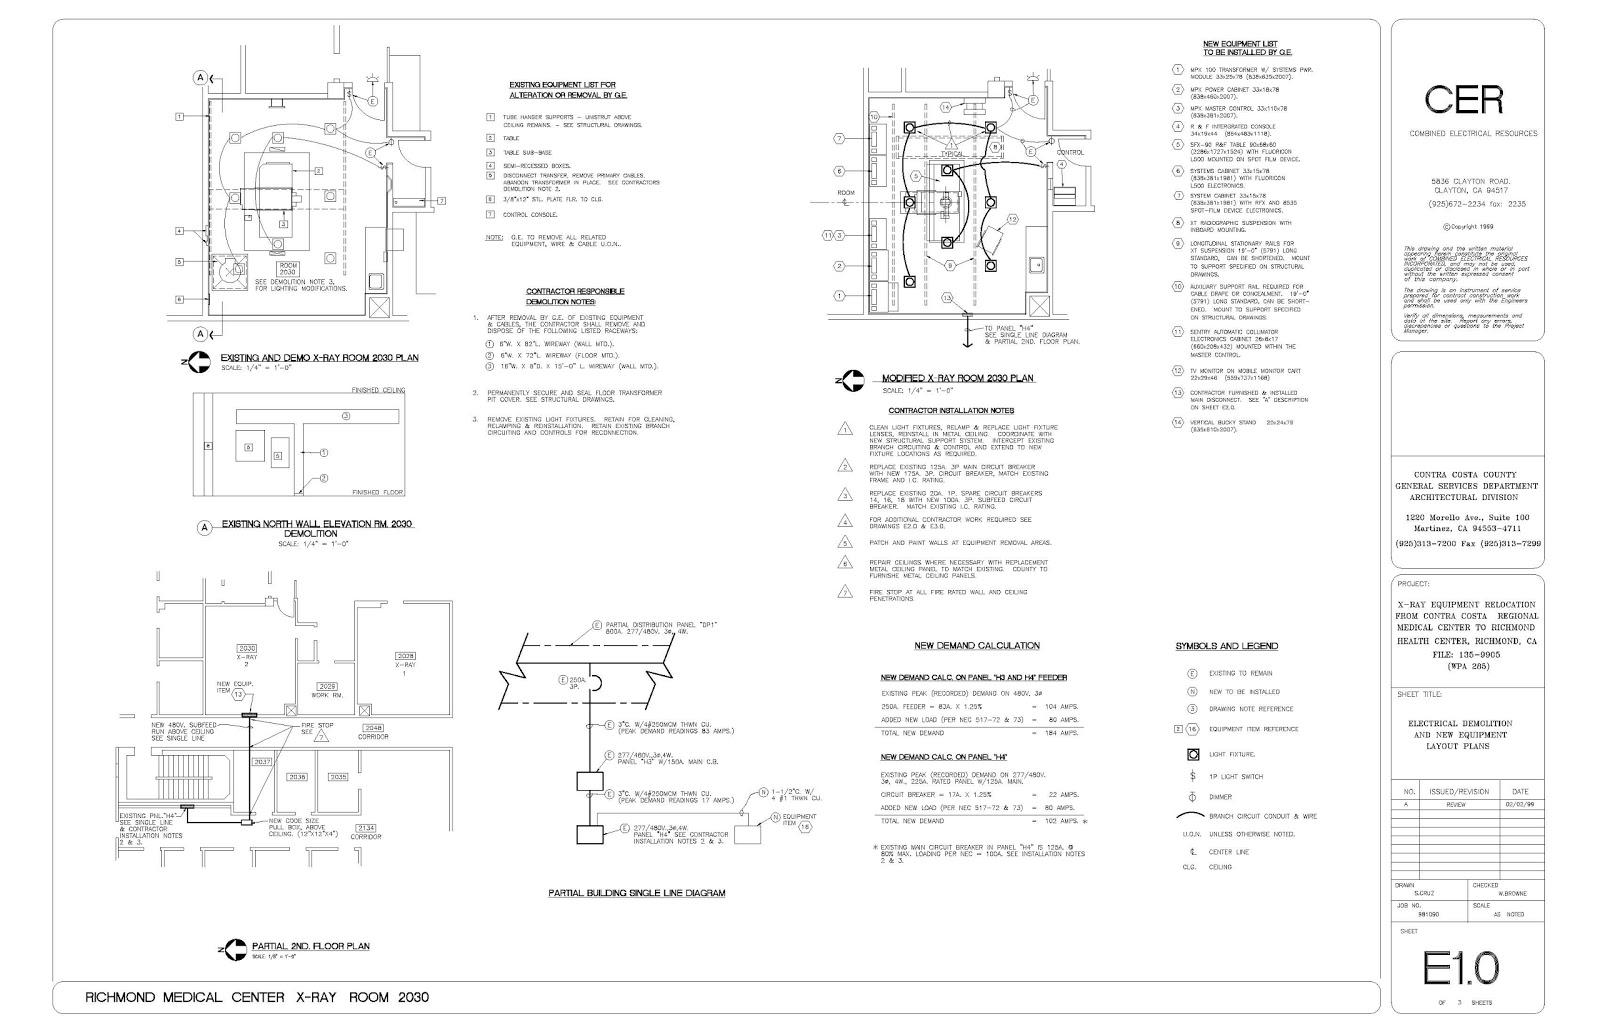 Images Of Electrical Engineering Drawings Golfclub Diagram Create An